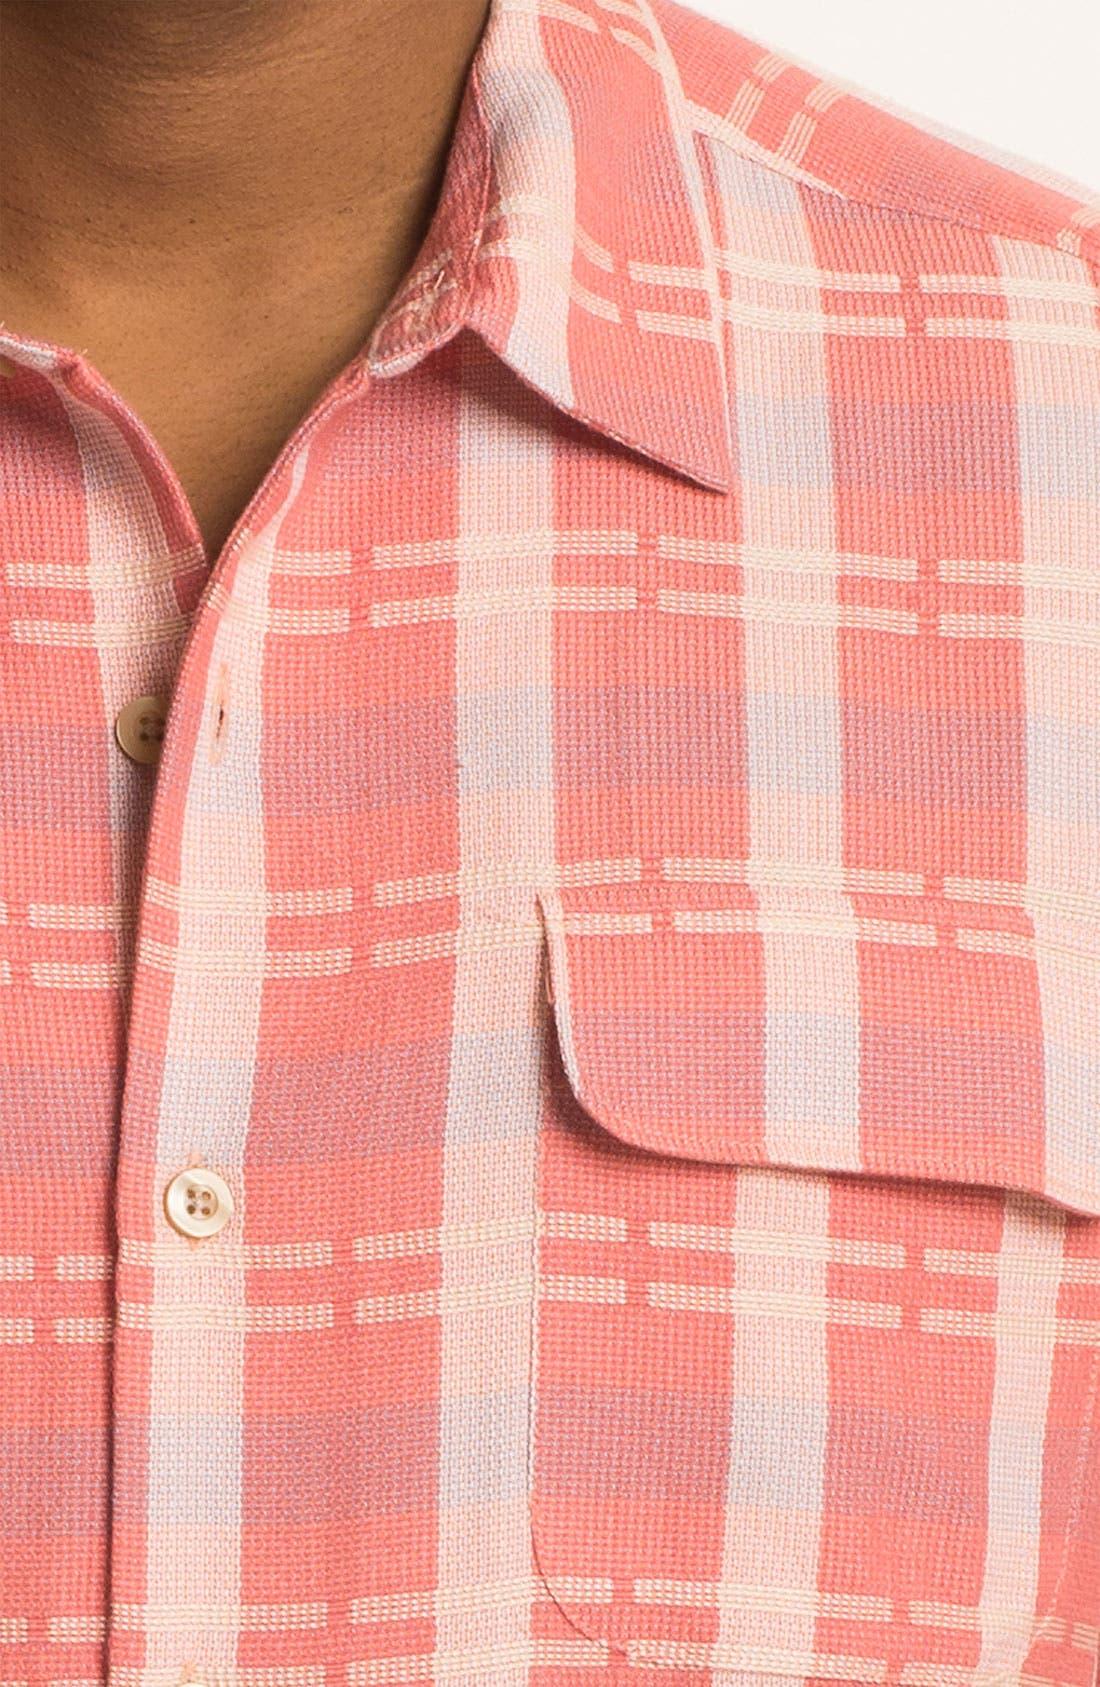 Alternate Image 3  - Tommy Bahama 'Plaid Modern' Silk & Cotton Sport Shirt